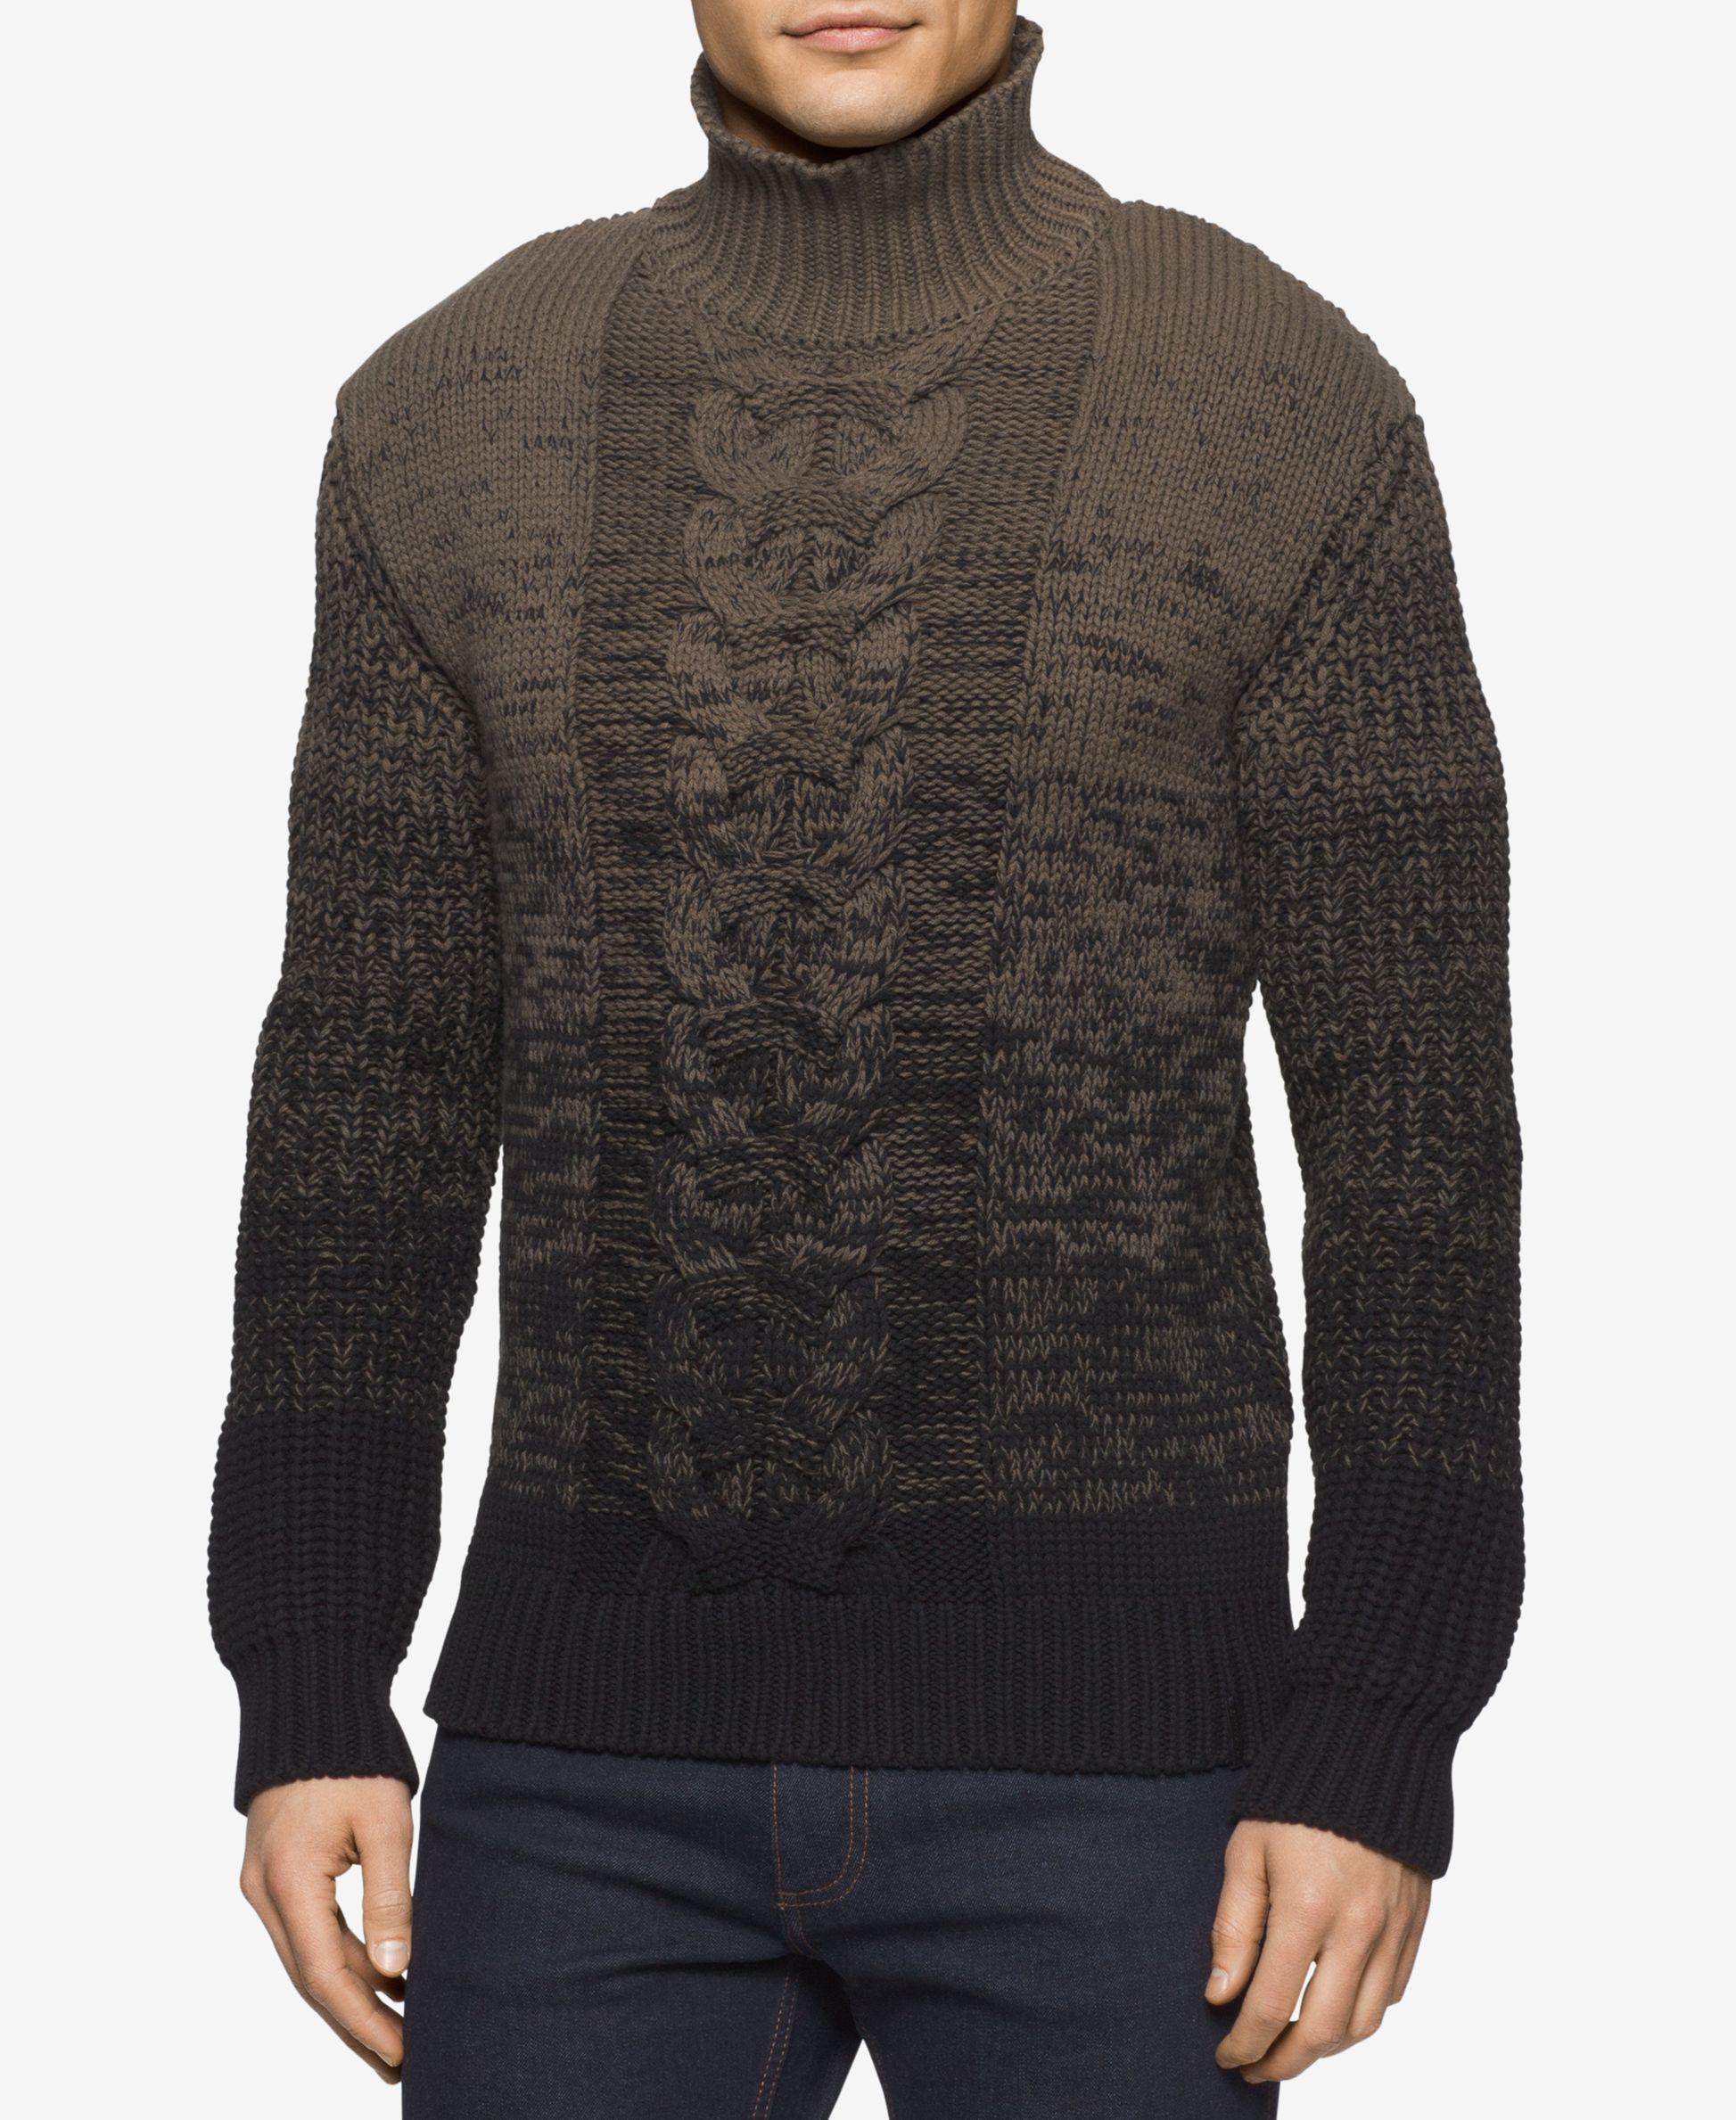 Calvin Klein Jeans Men's Ombre Turtleneck Sweater